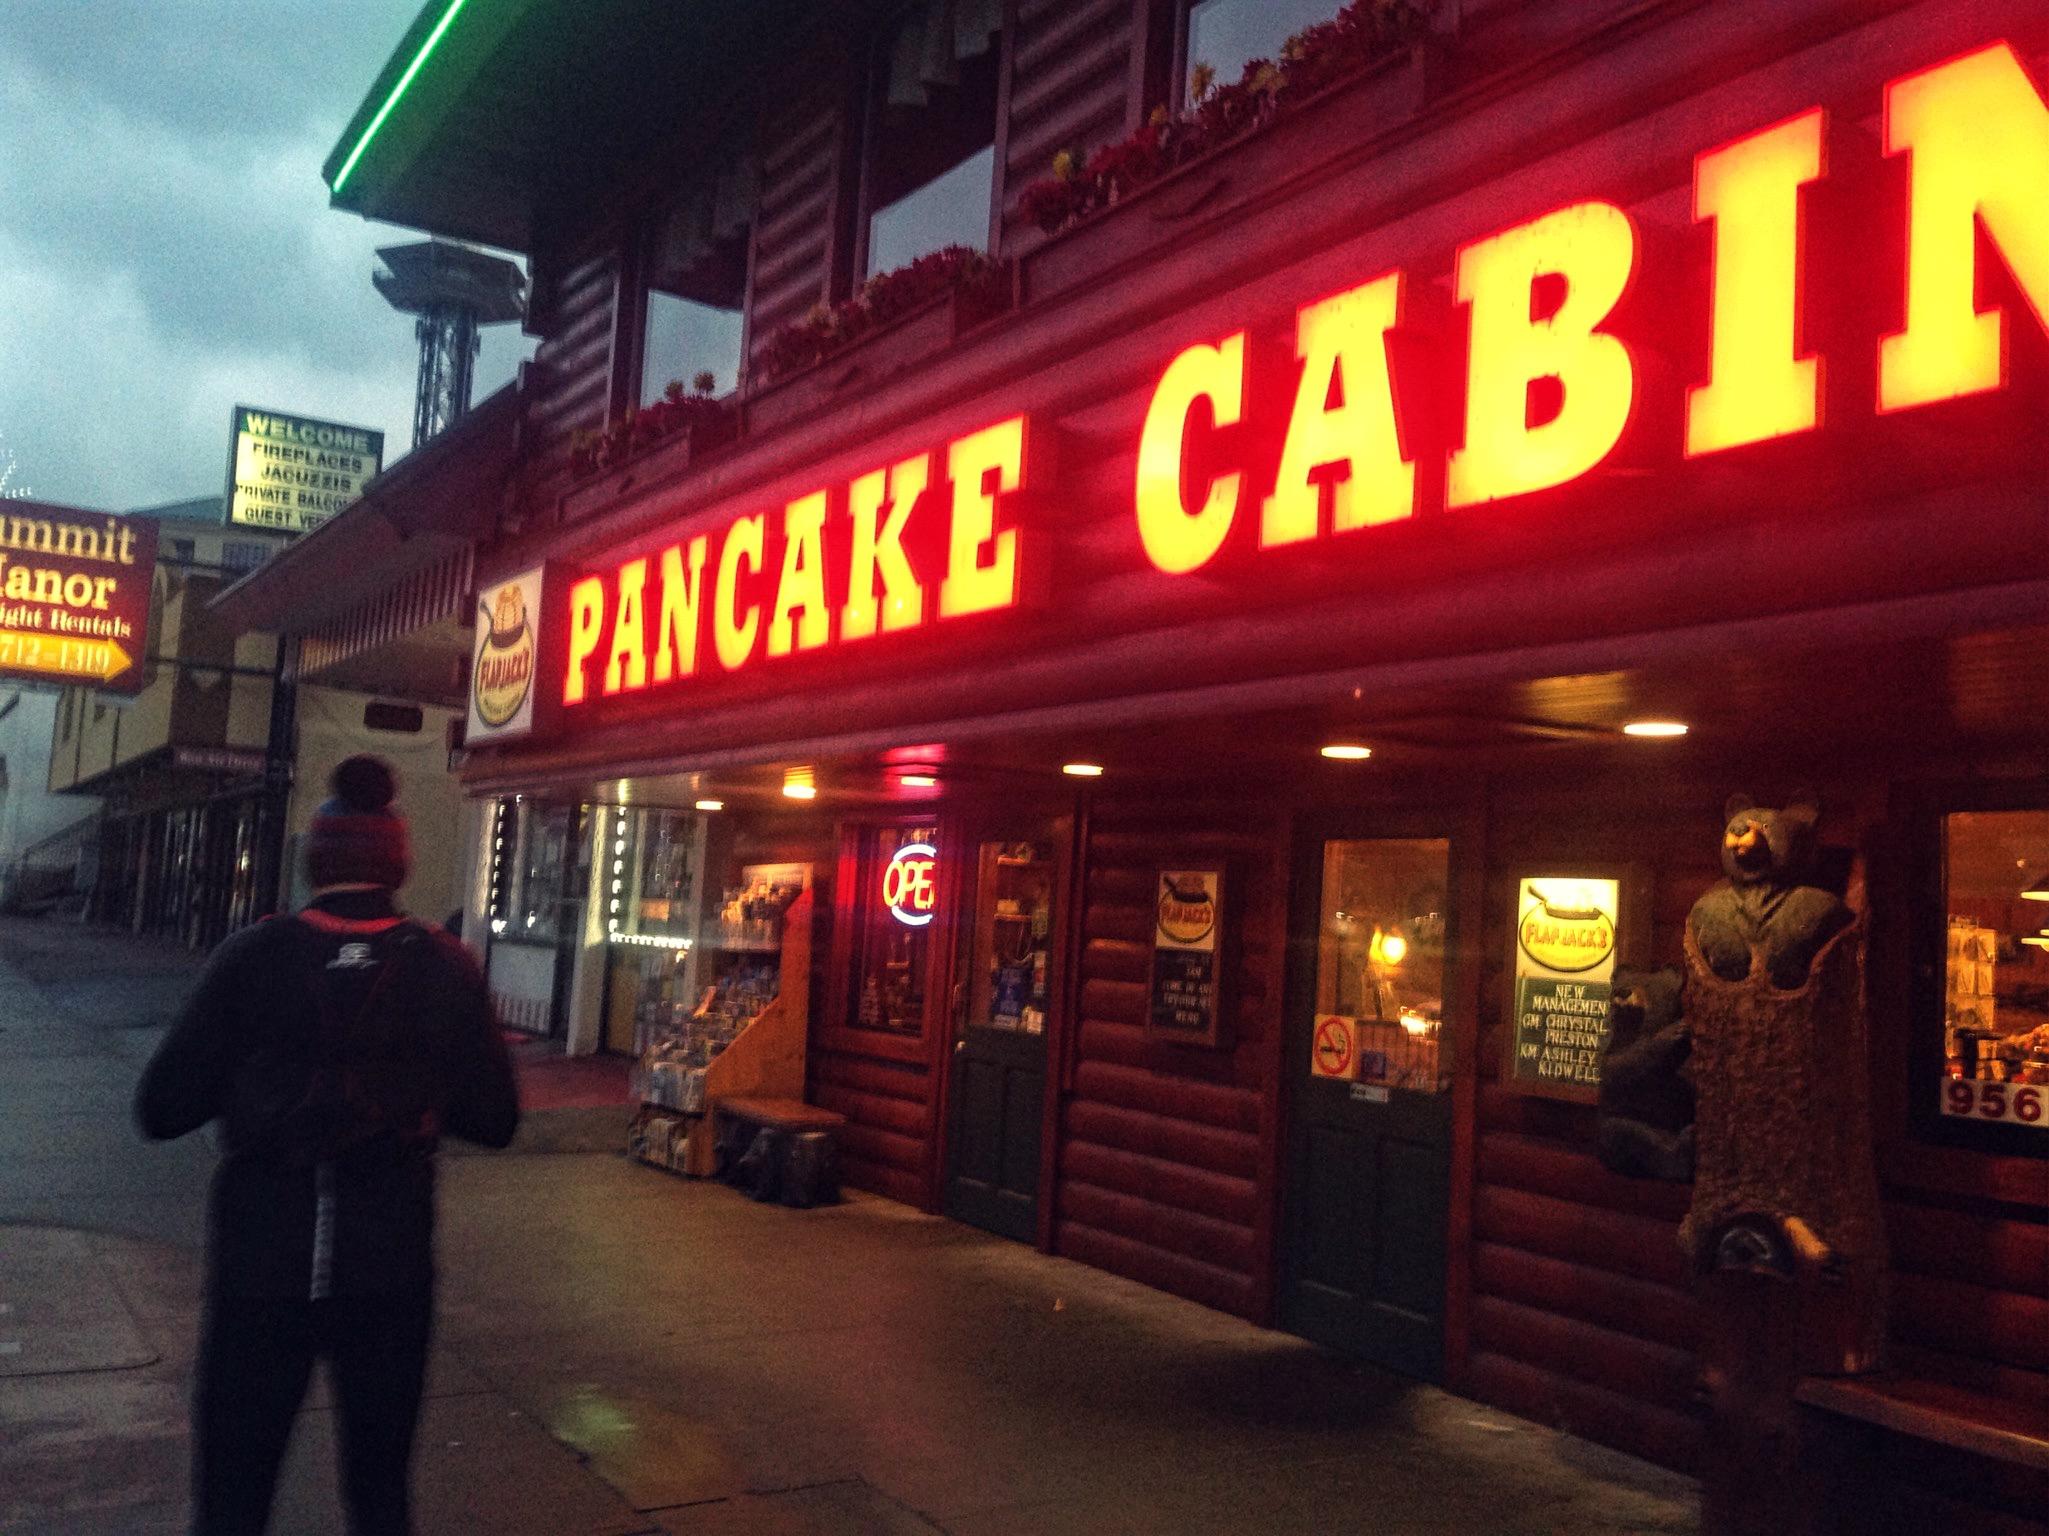 Pancakes to Poker. Photo cred: Jeff Davis